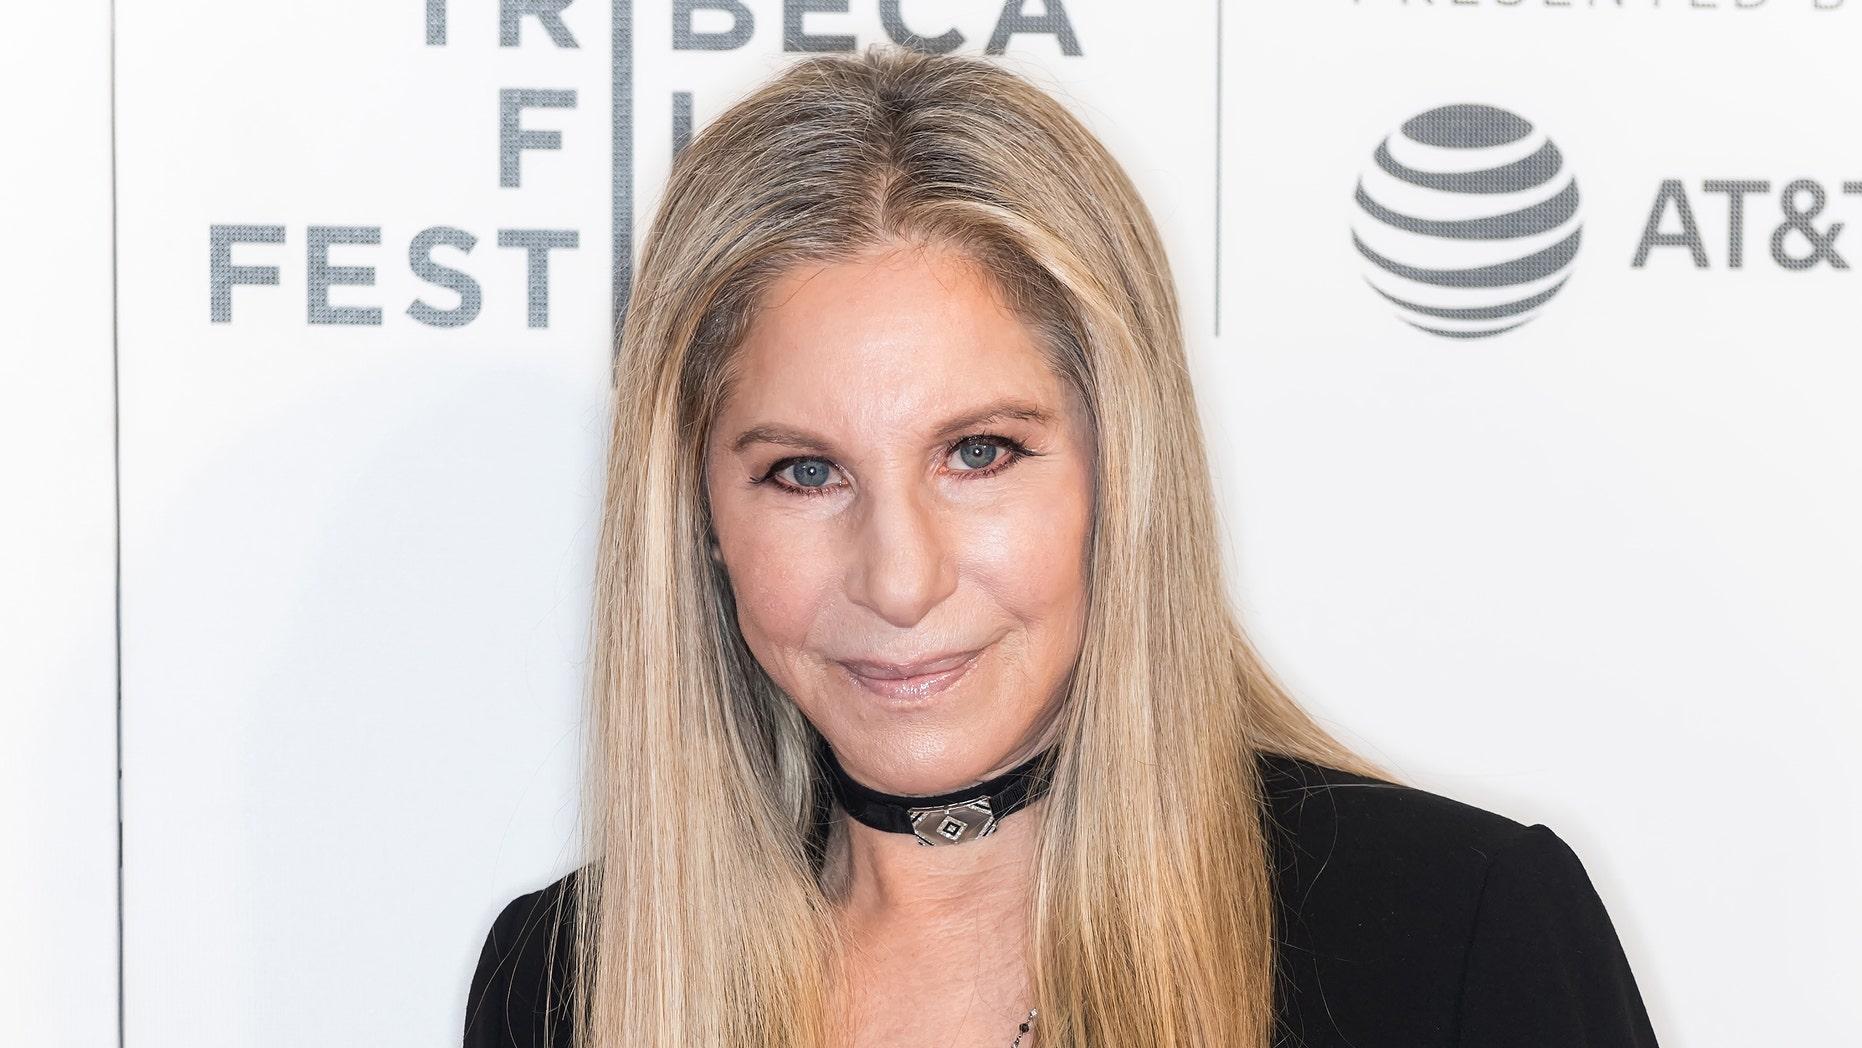 Barbra Streisand visits Tribeca Talks: Storyteller on April 29, 2017 in New York City. (Photo by Gilbert Carrasquillo / FilmMagic)